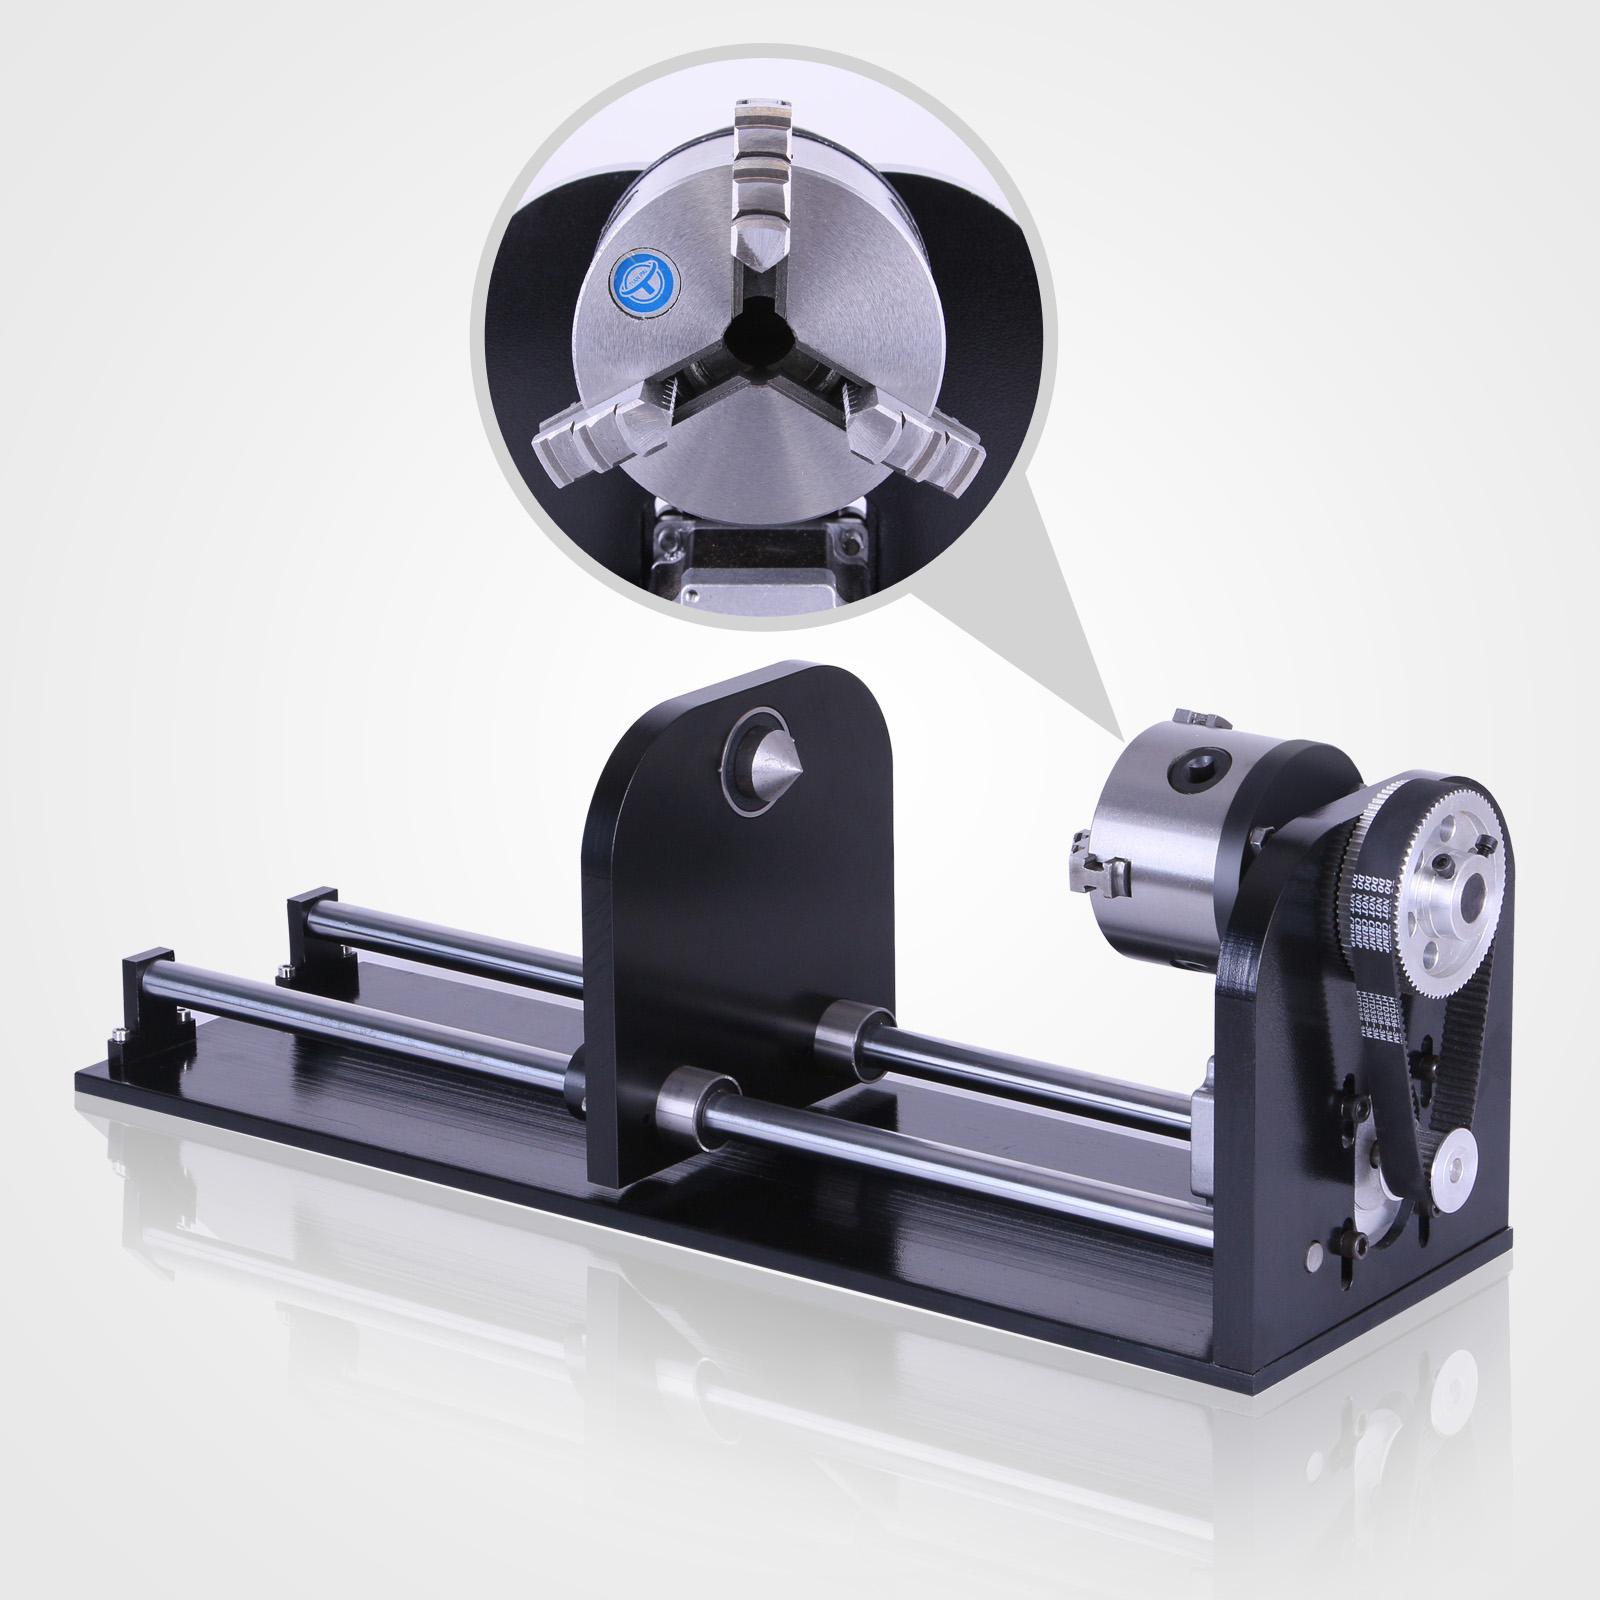 Macchina-per-Incisione-Laser-CO2-40-130W-Asse-Rotante-Tagliatrice-Incisore miniatura 84